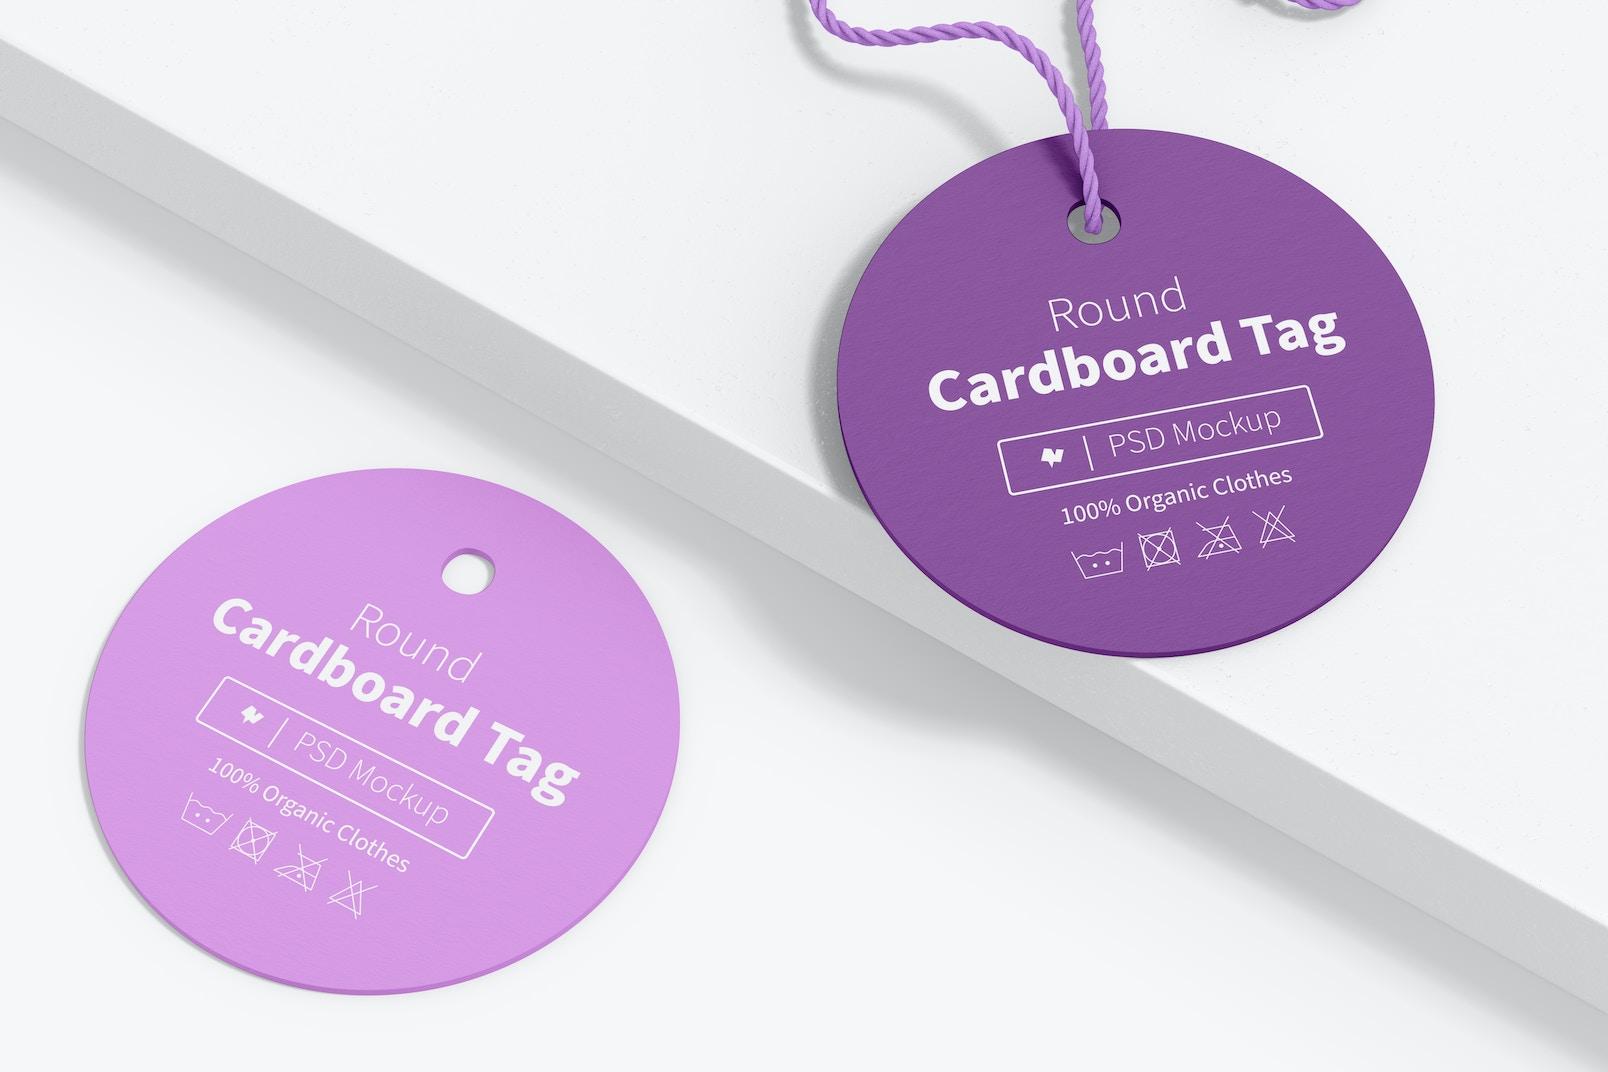 Round Cardboard Tags Mockup